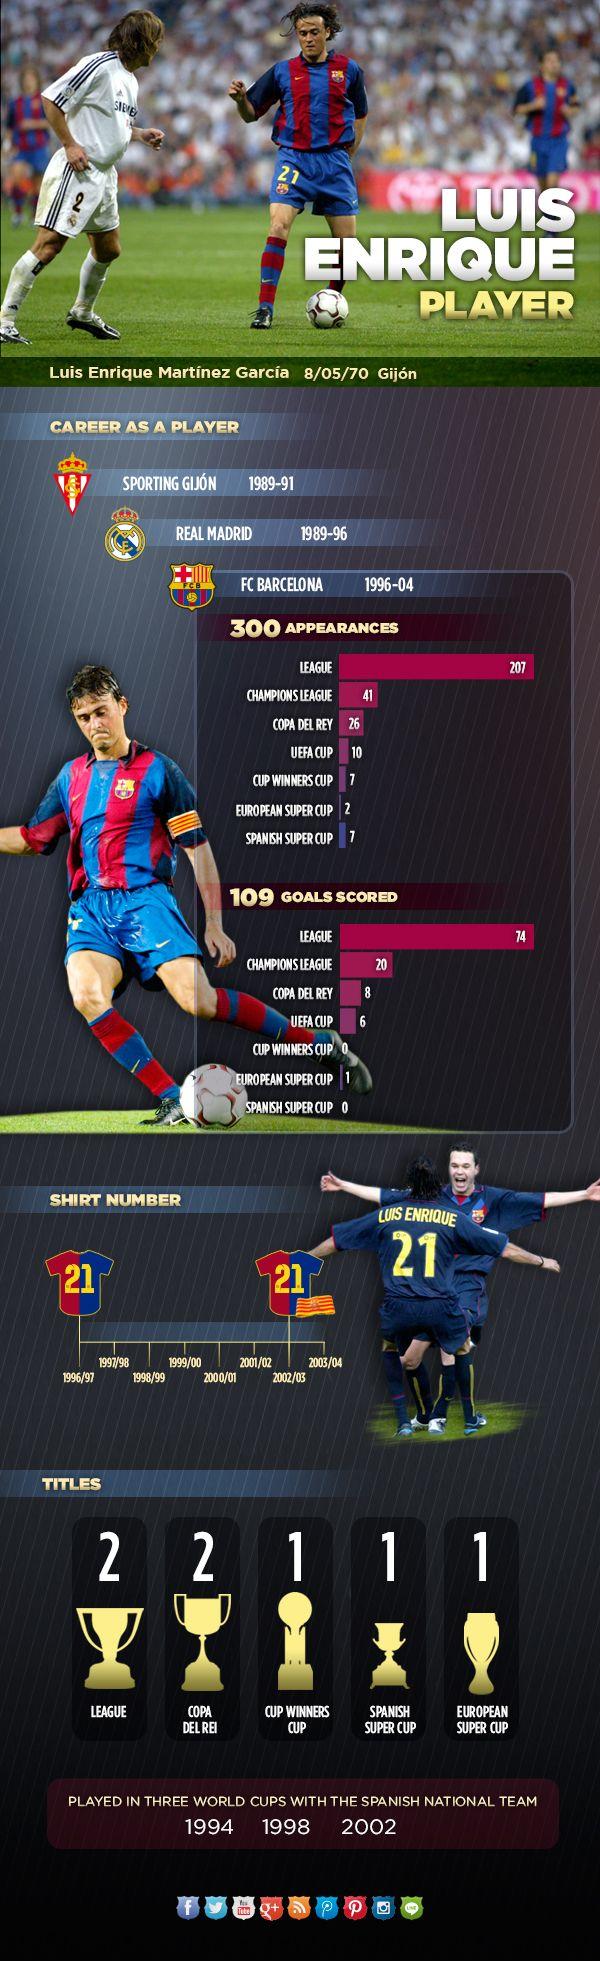 Luis Enrique's career at FC Barcelona. #LuisEnrique #Coach #FCBarcelona